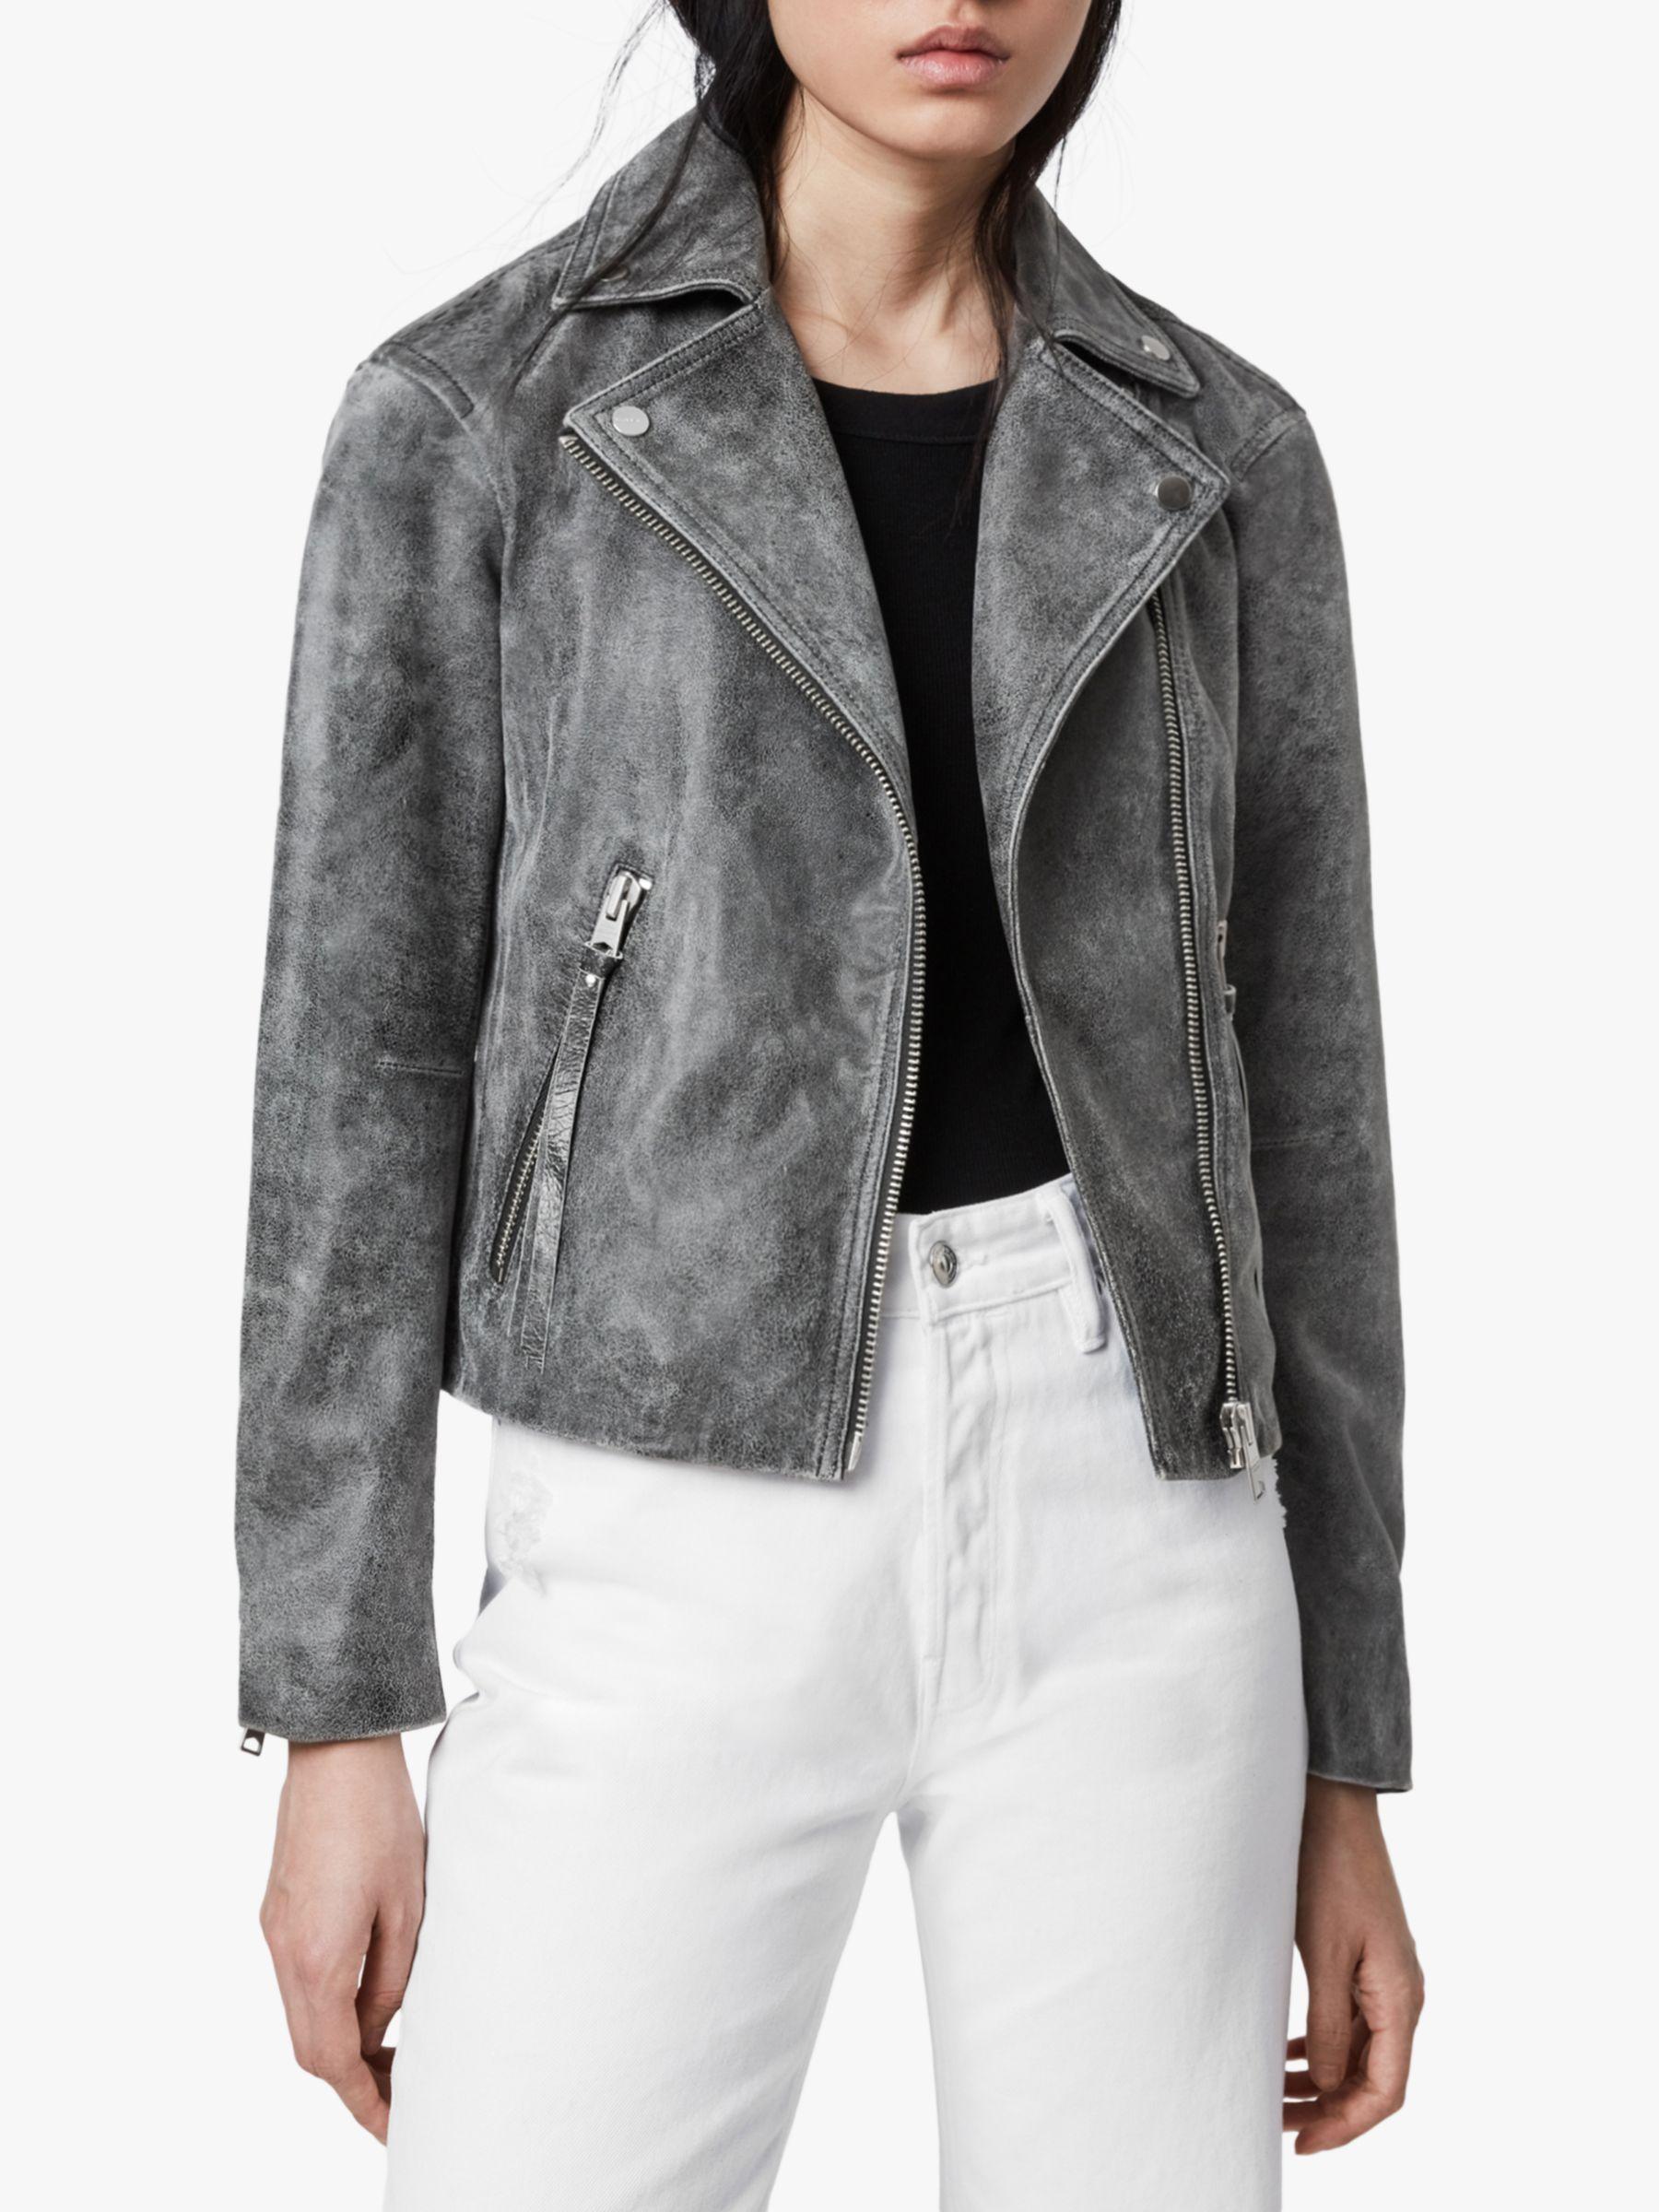 AllSaints AllSaints Dalby Iris Leather Biker Jacket, Black